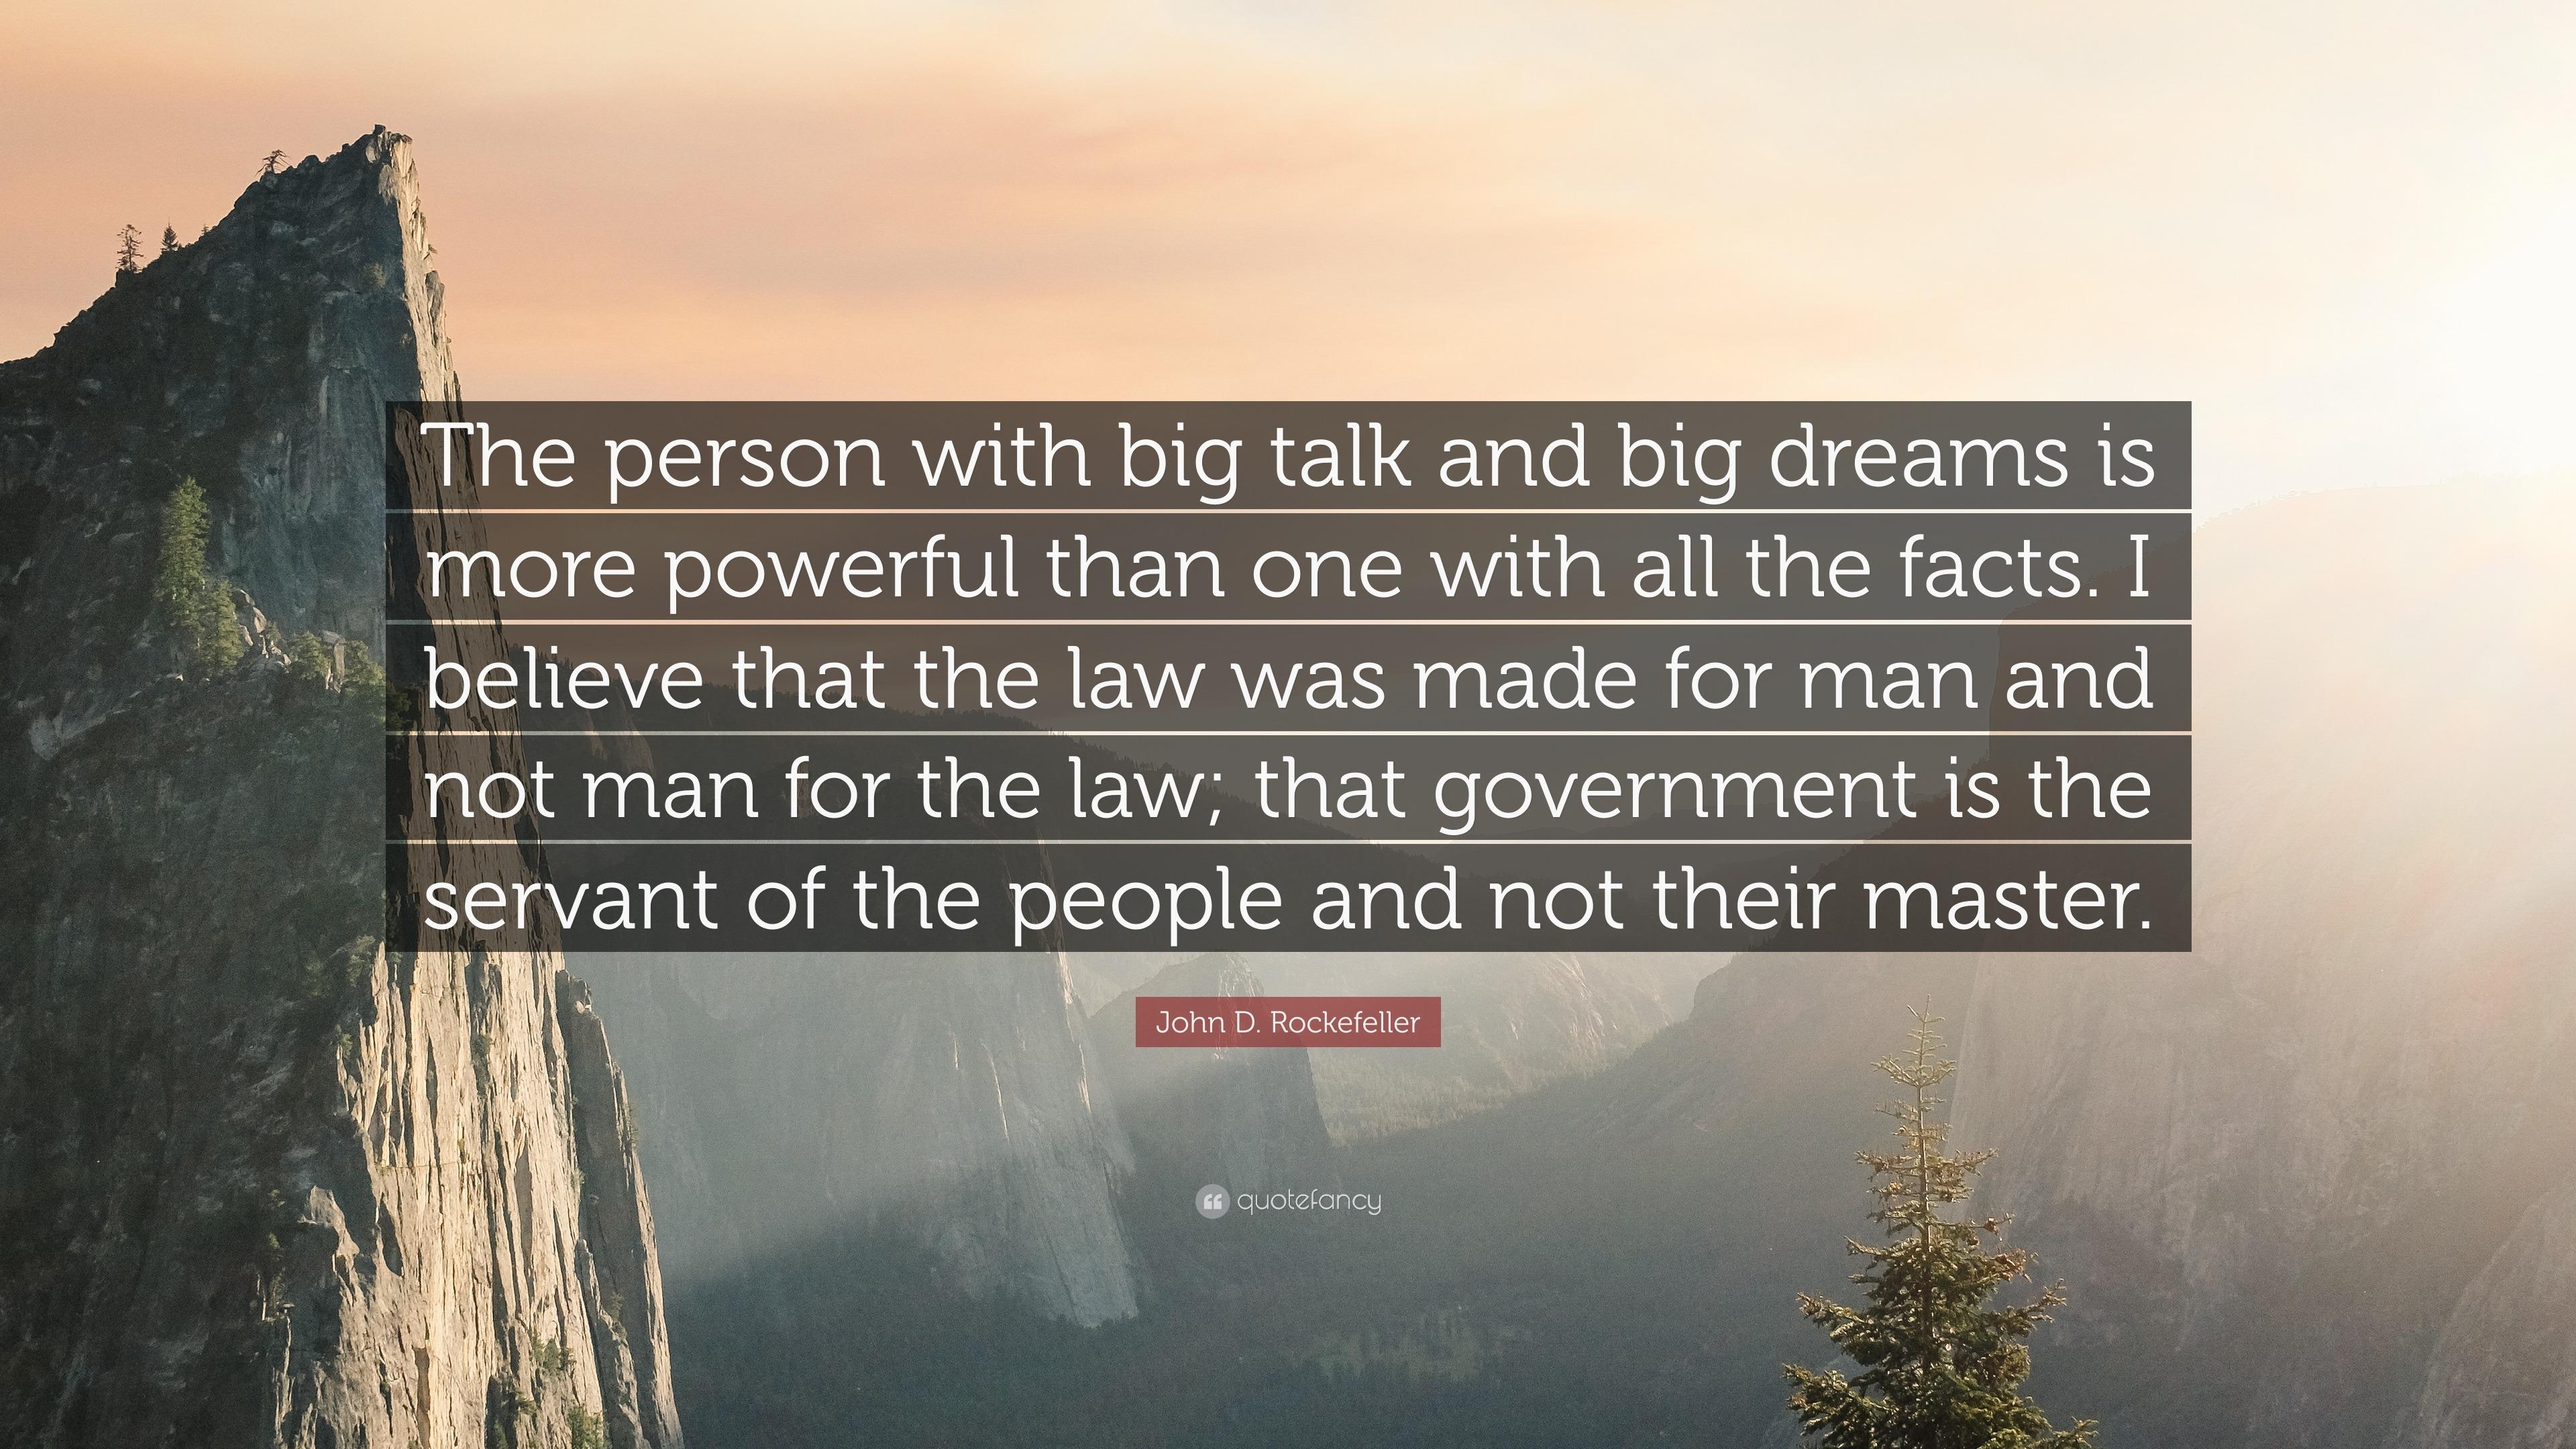 John D Rockefeller Quote The Person With Big Talk And Big Dreams